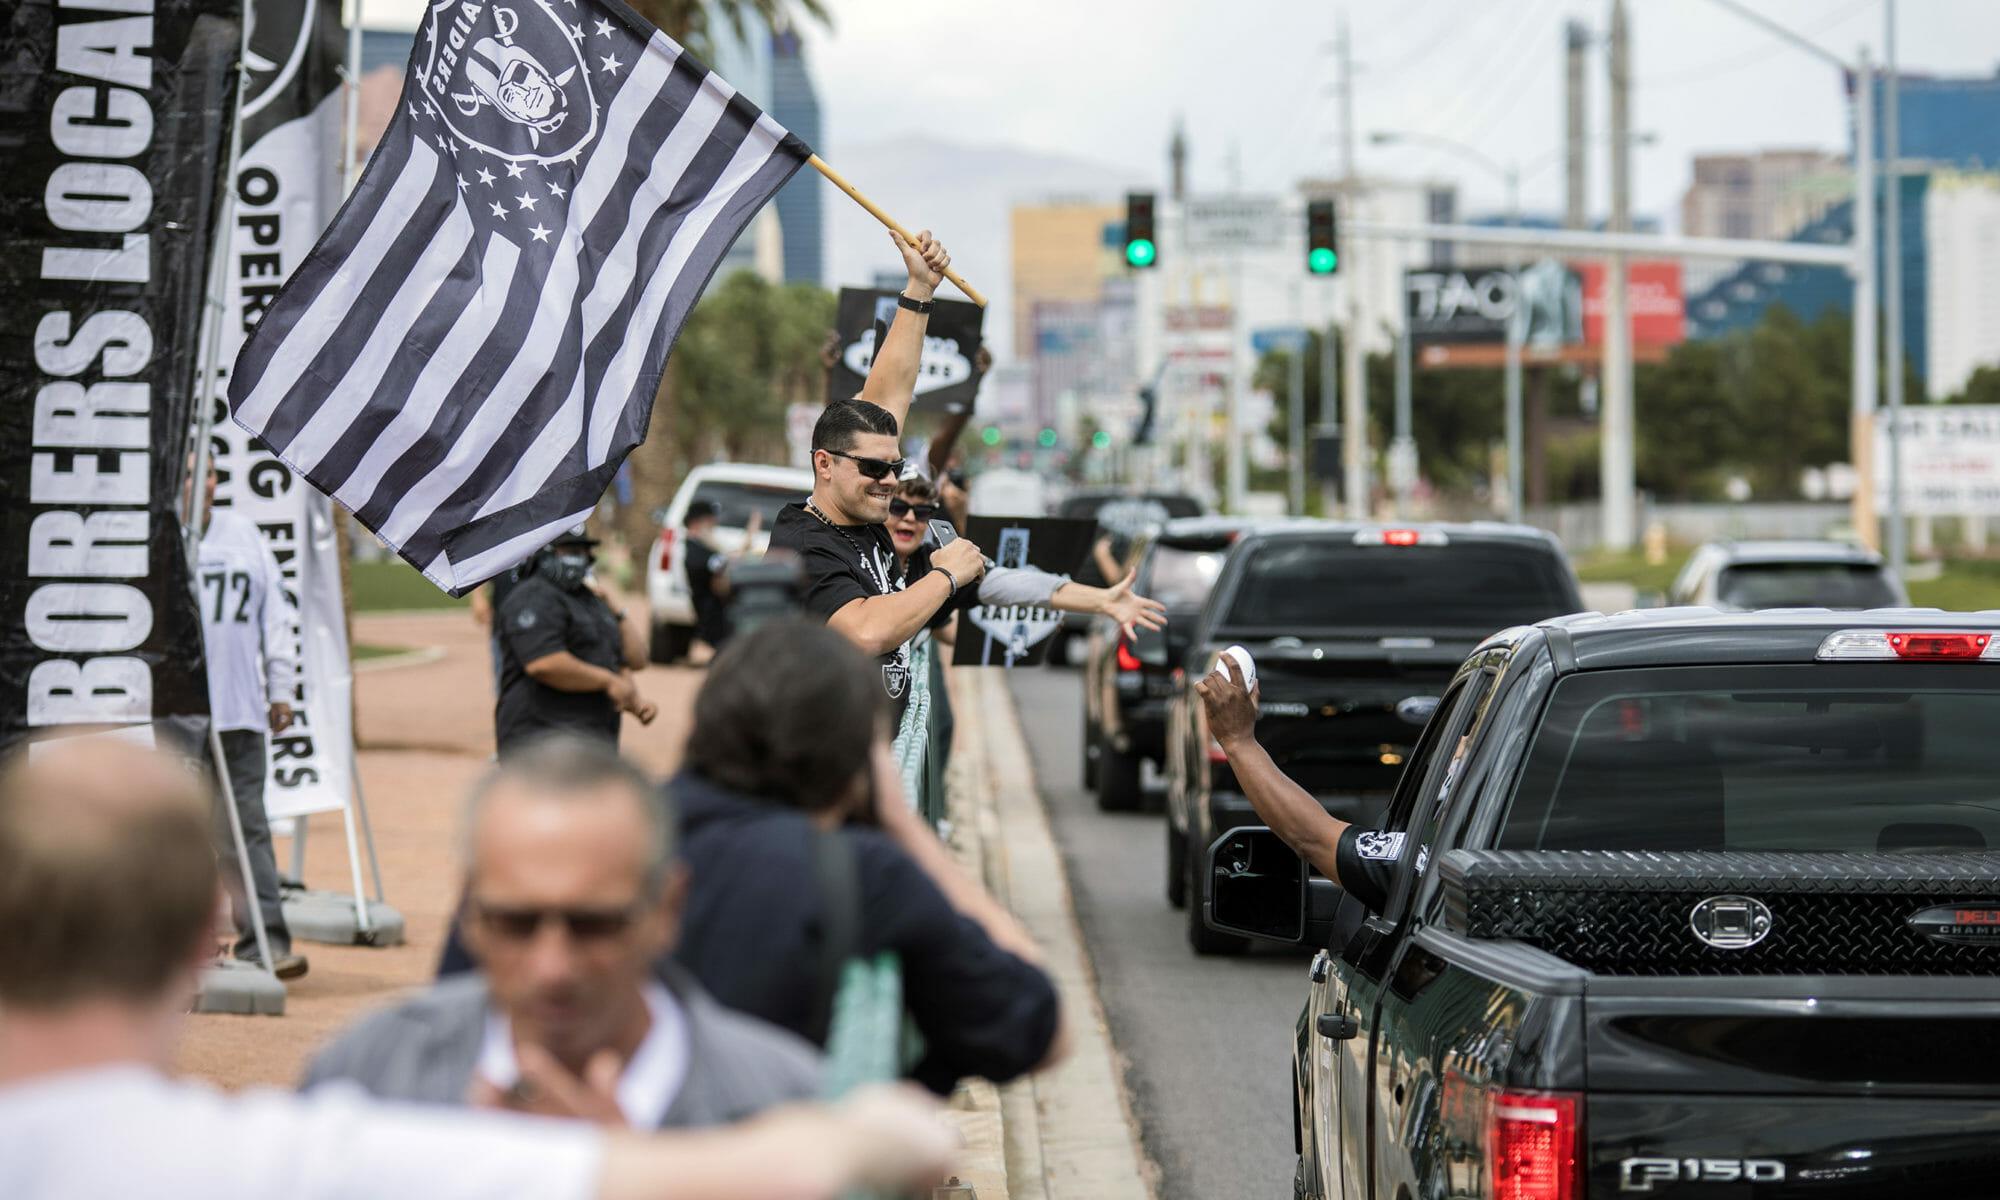 A man waiving a Raiders flag on a sidewalk